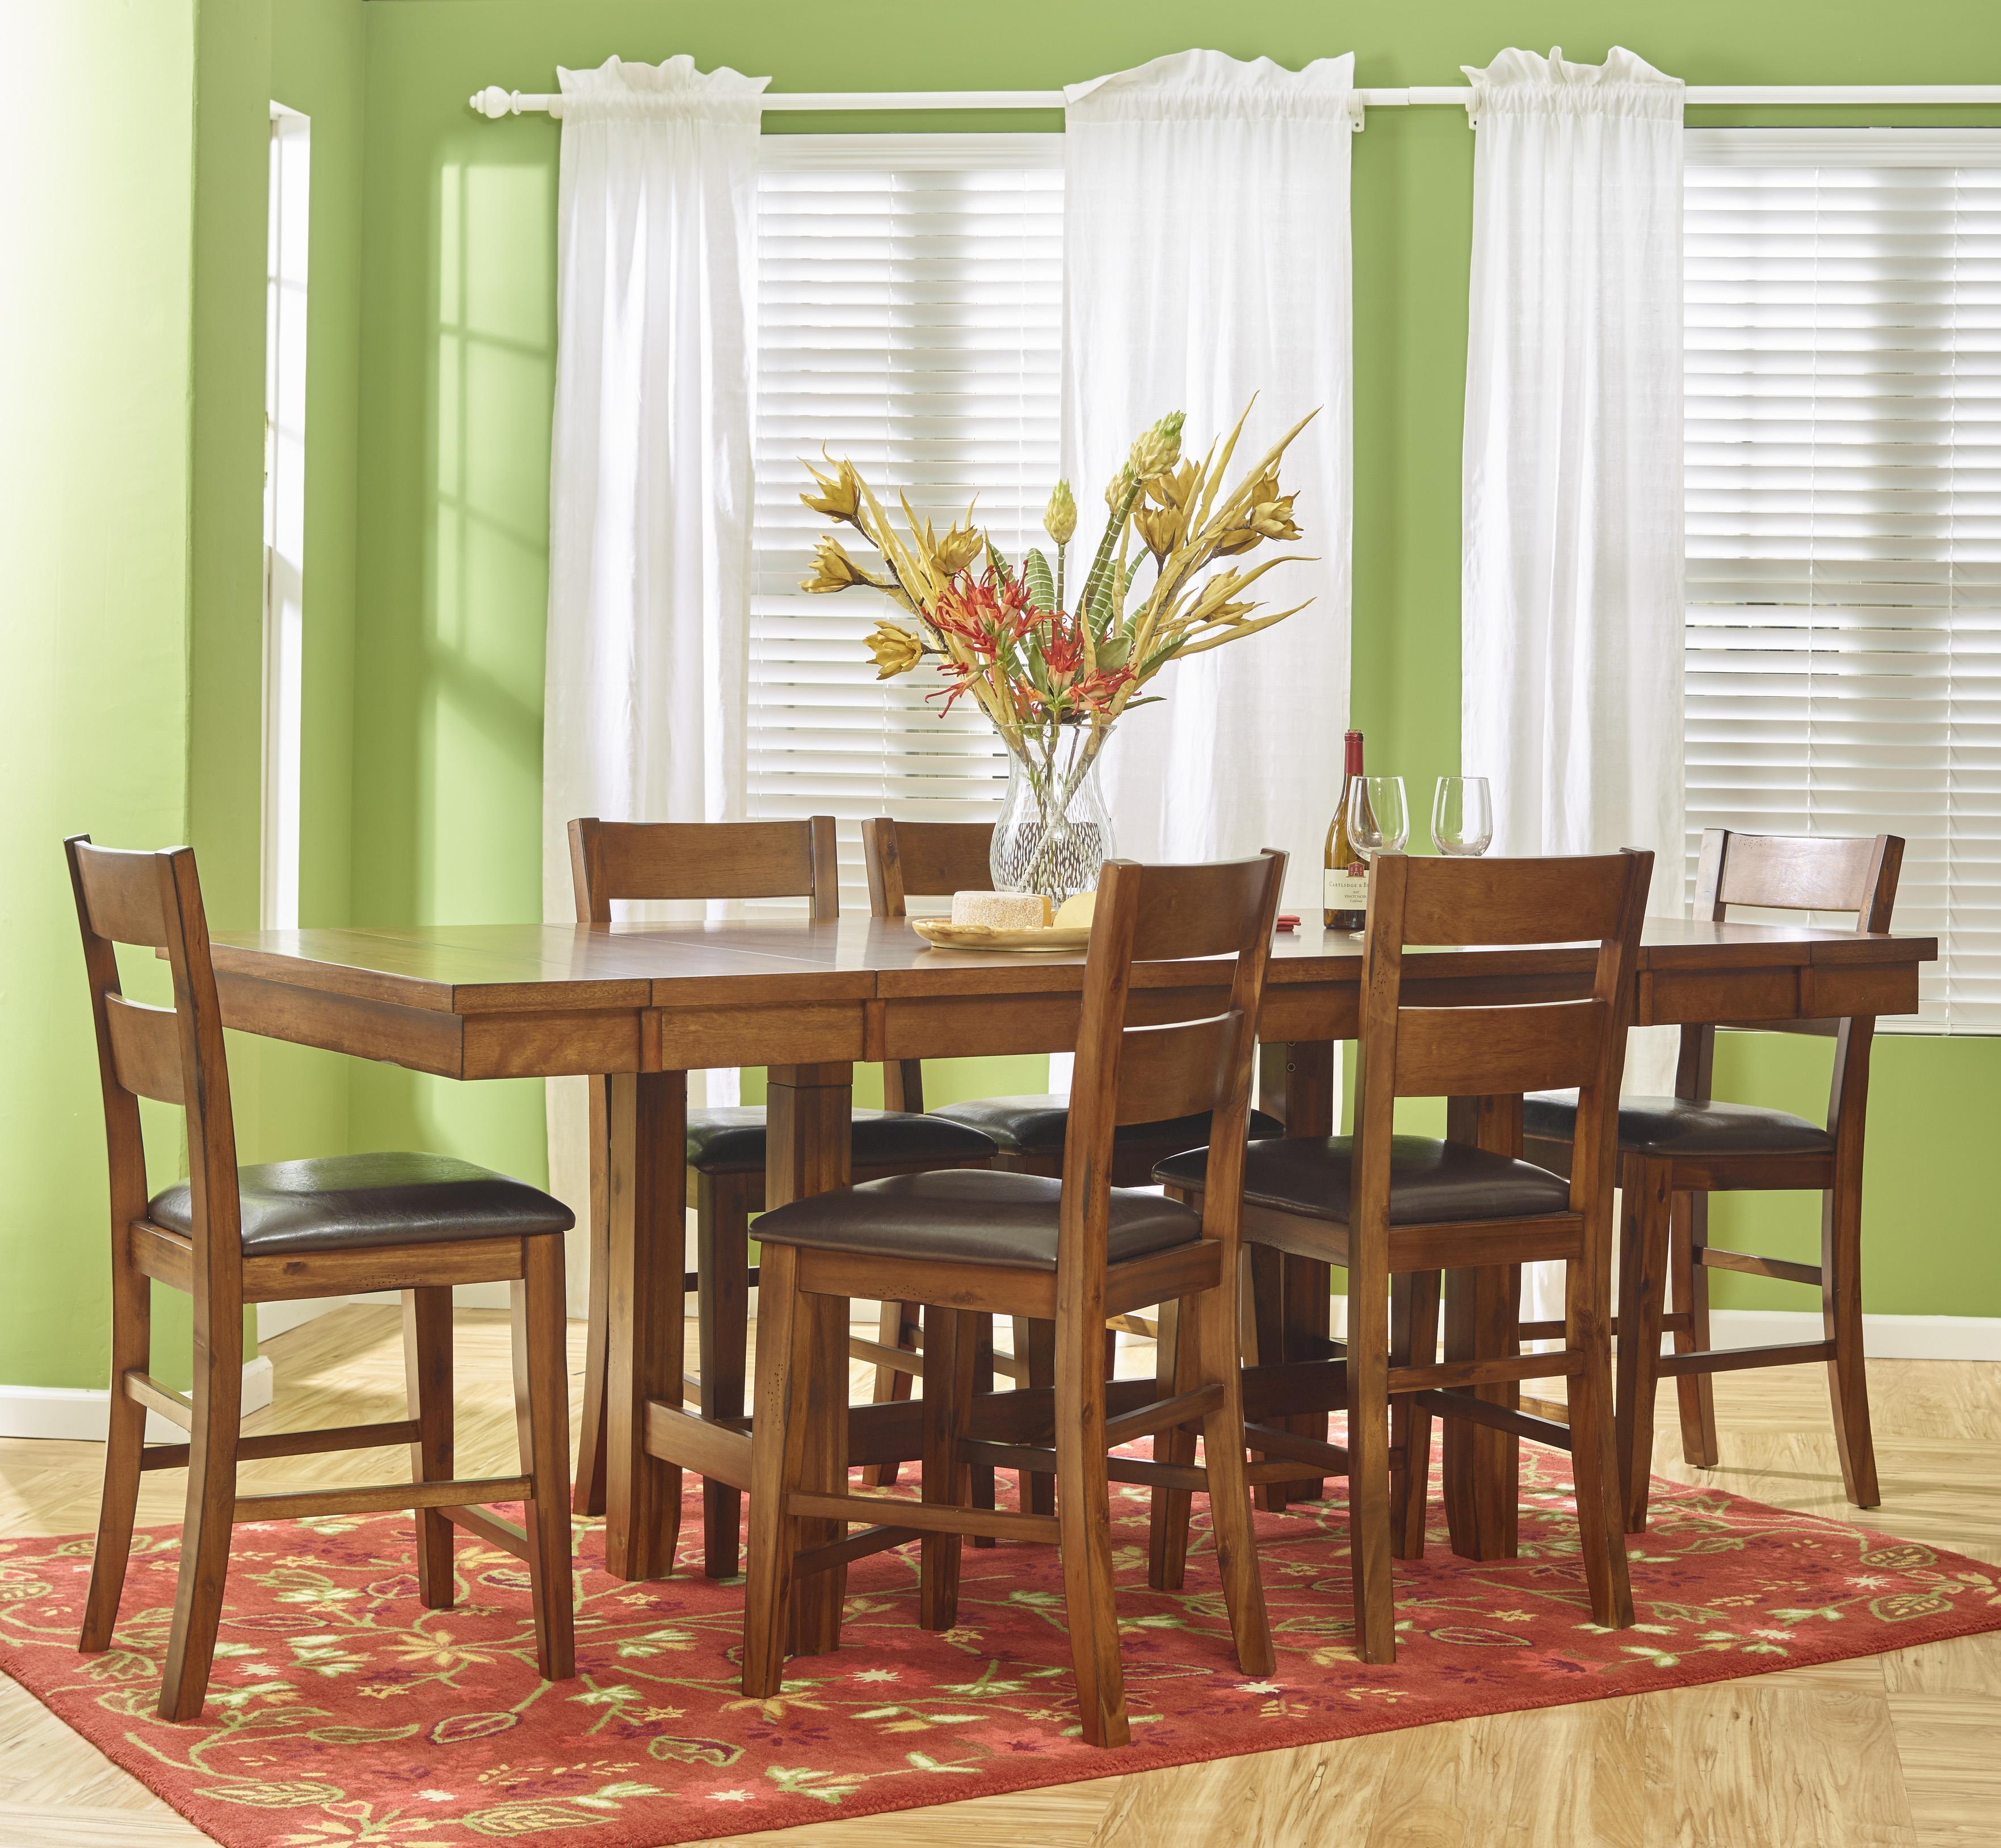 Jofran Plantation 7-Piece Dining Counter Height Set - Item Number: 505-93+6xBS219KD